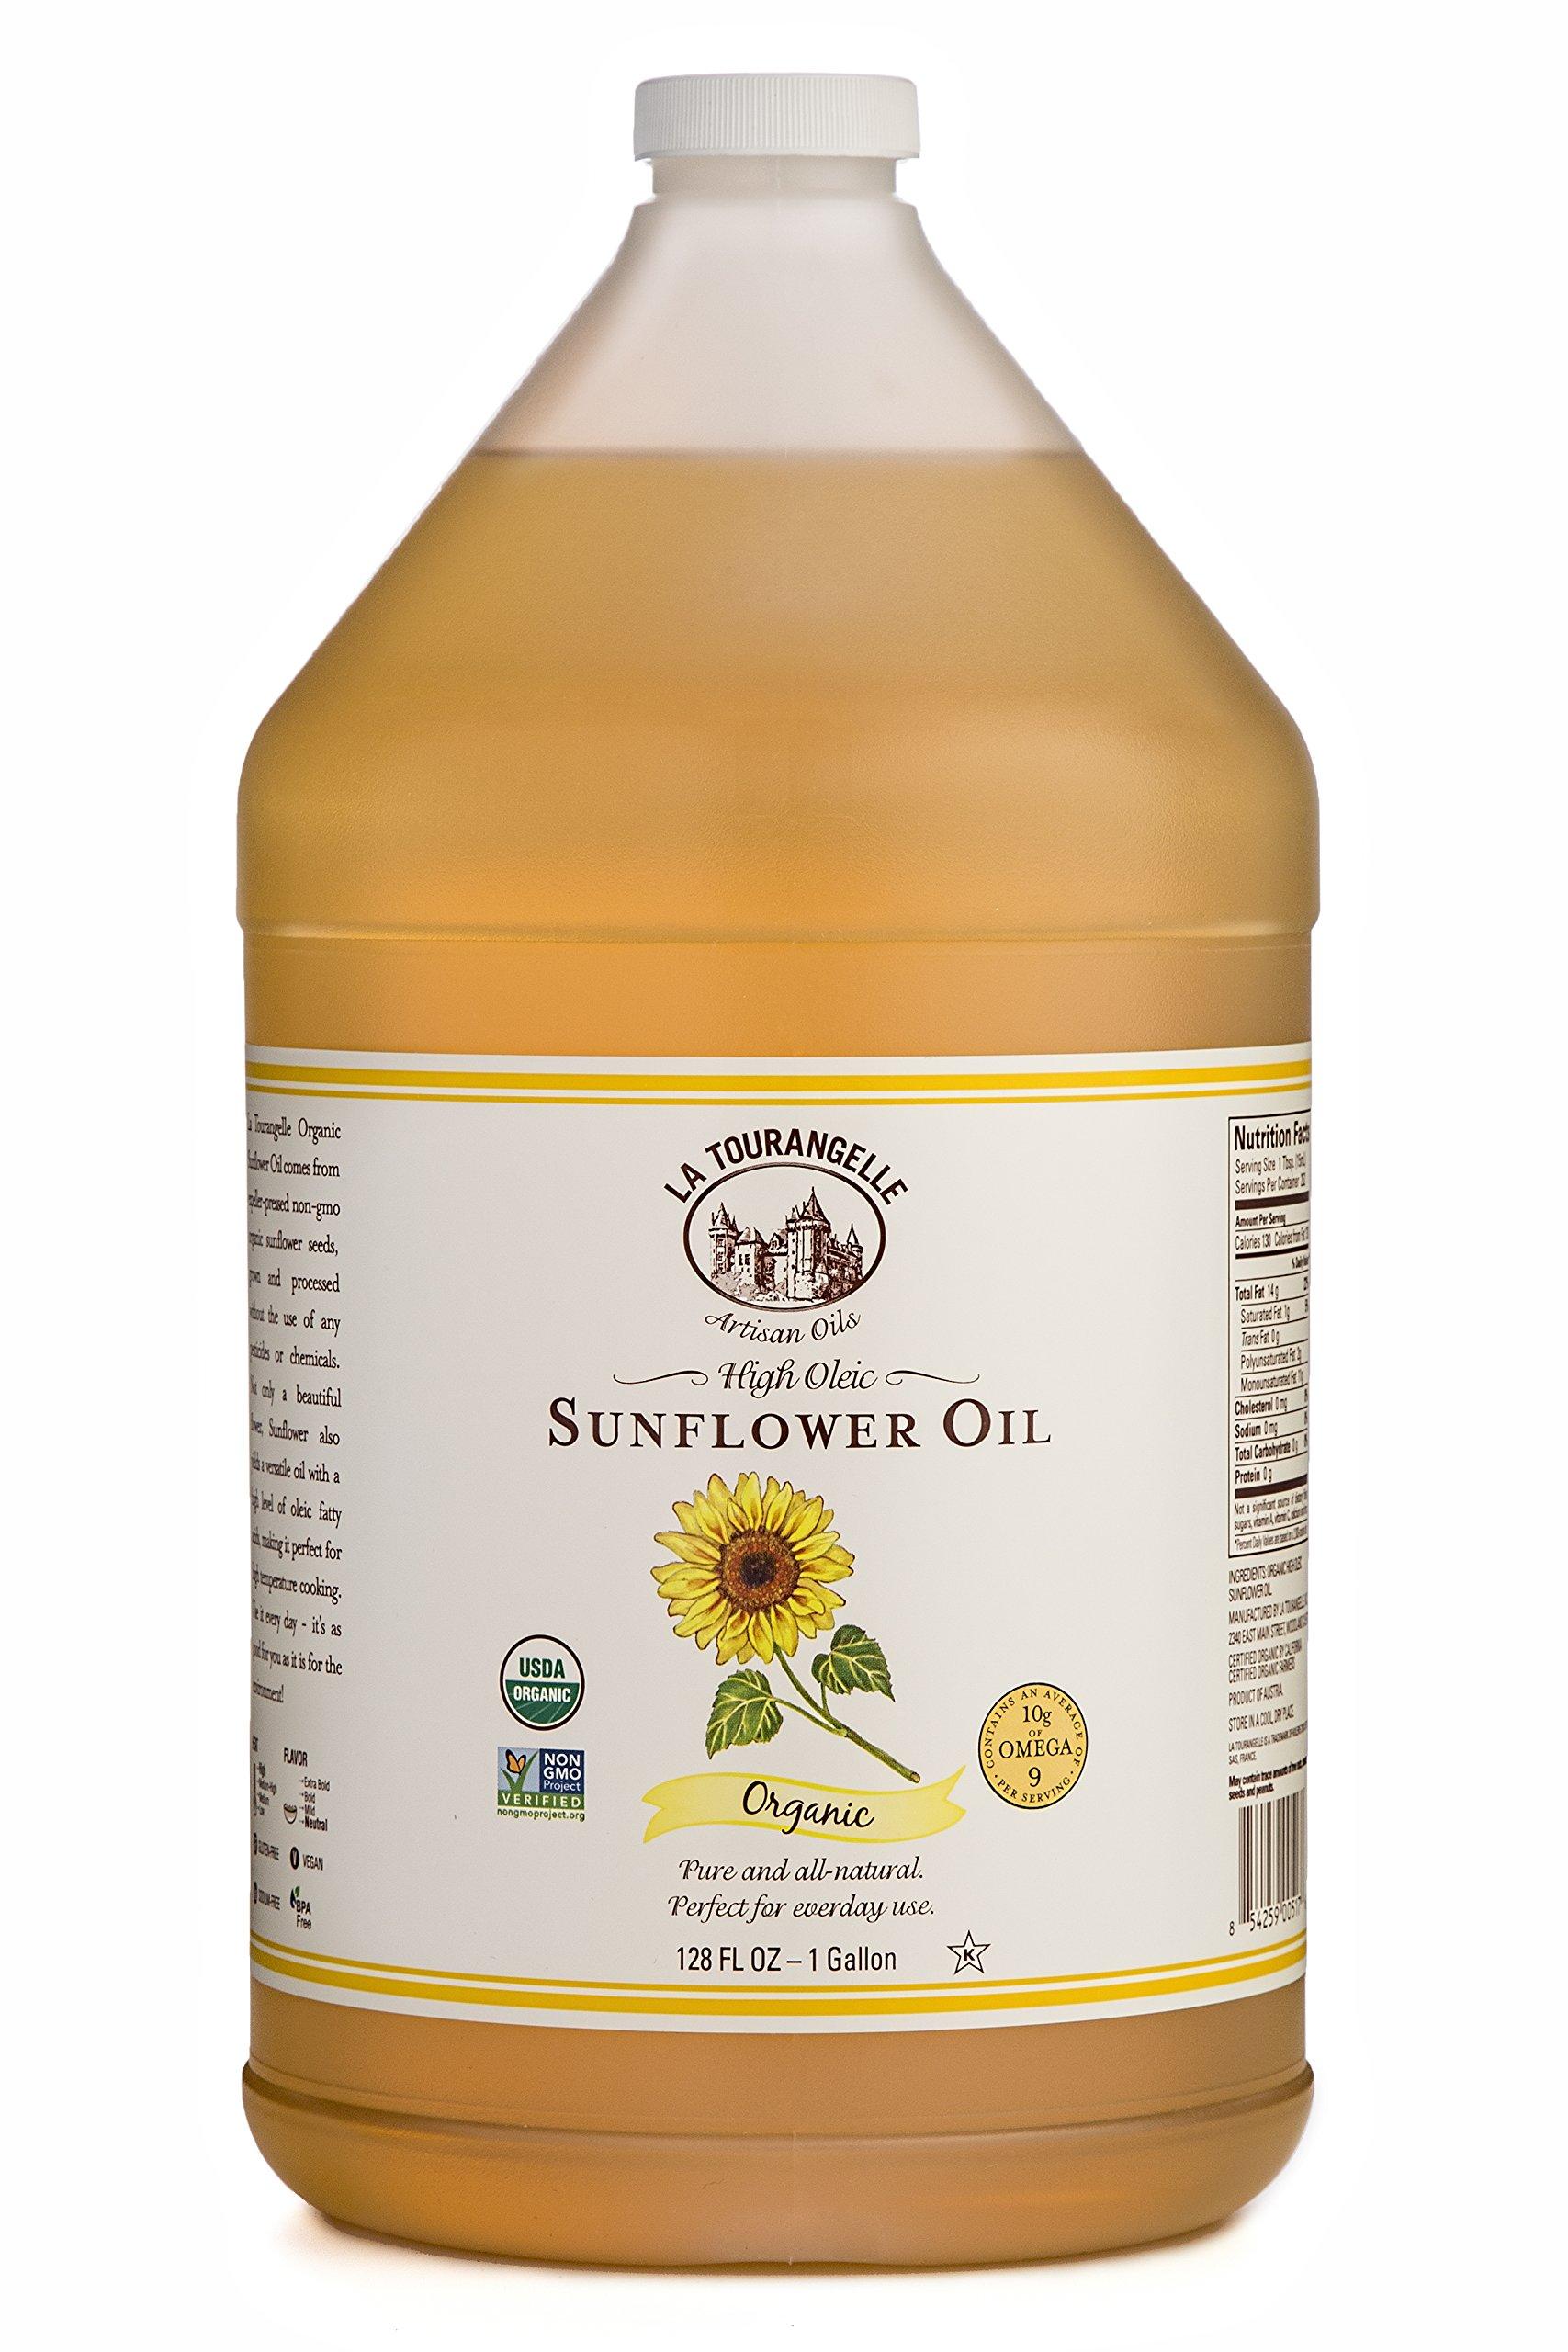 La Tourangelle, Organic Sunflower Oil, 128 Fluid Ounce by La Tourangelle